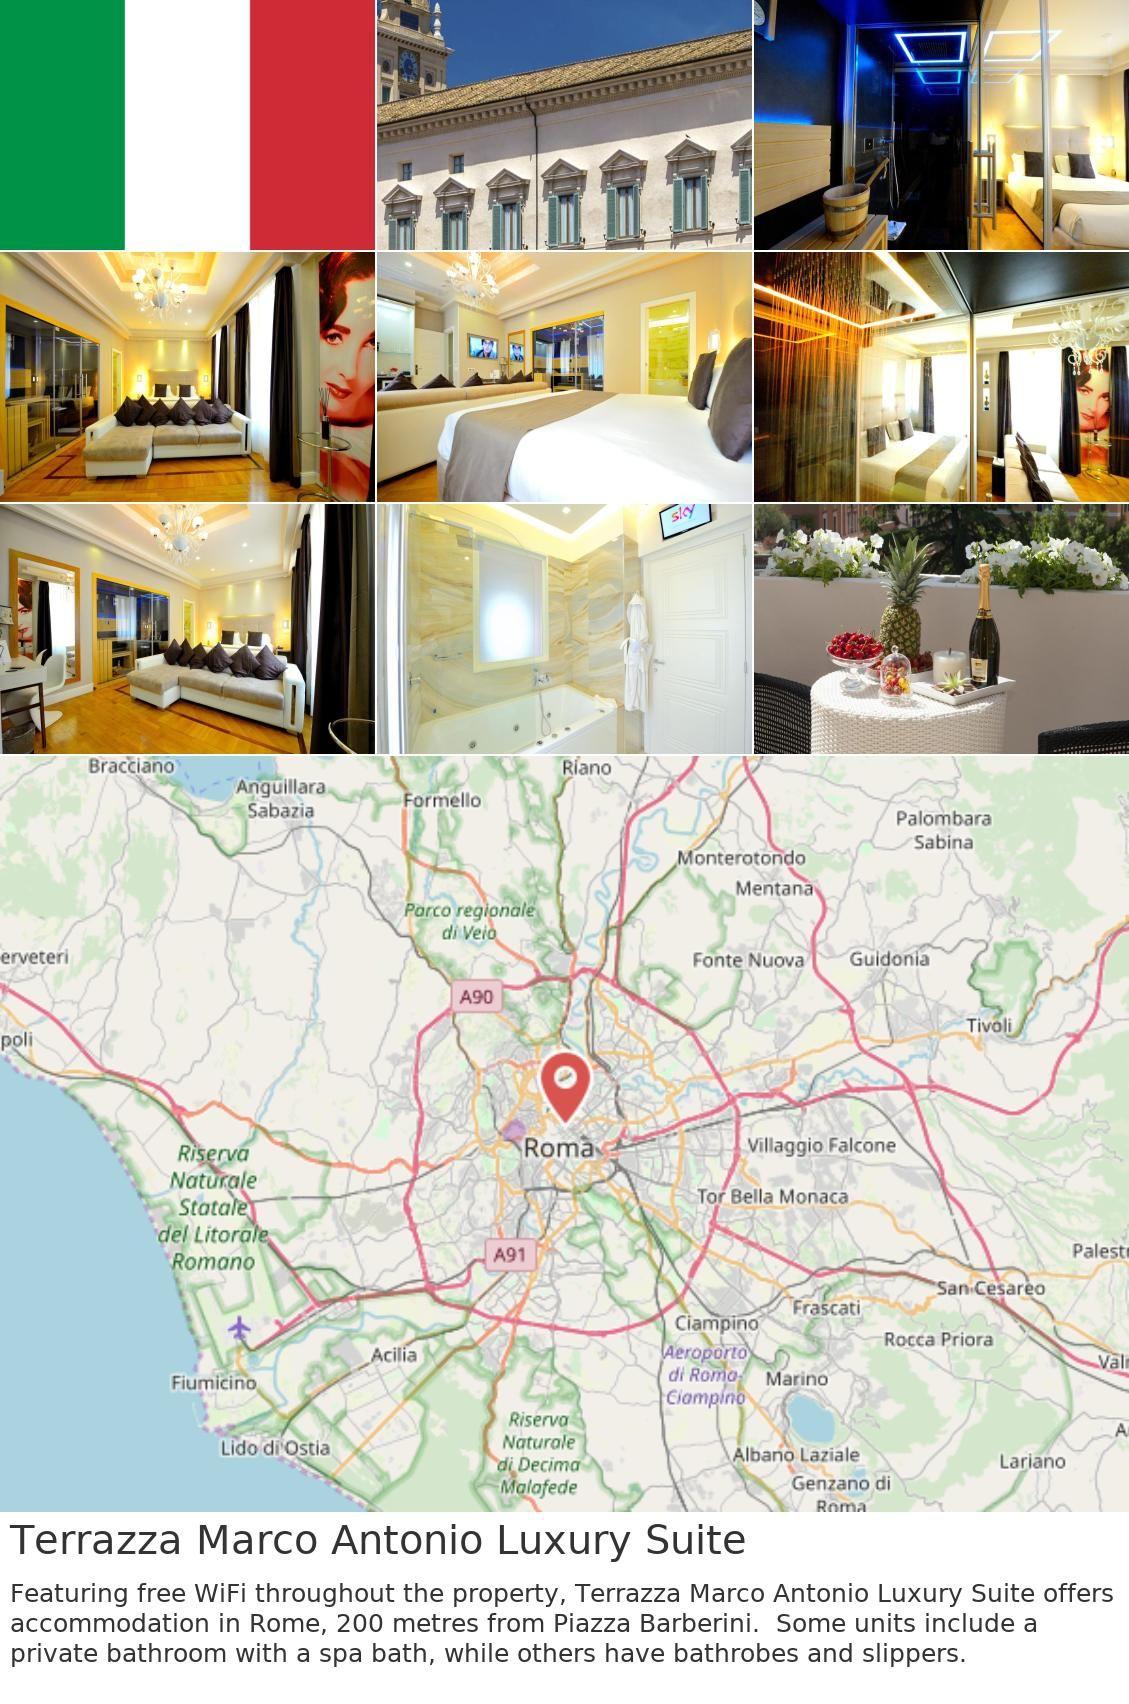 Terrazza Marco Antonio Luxury Suite In 2019 Italy